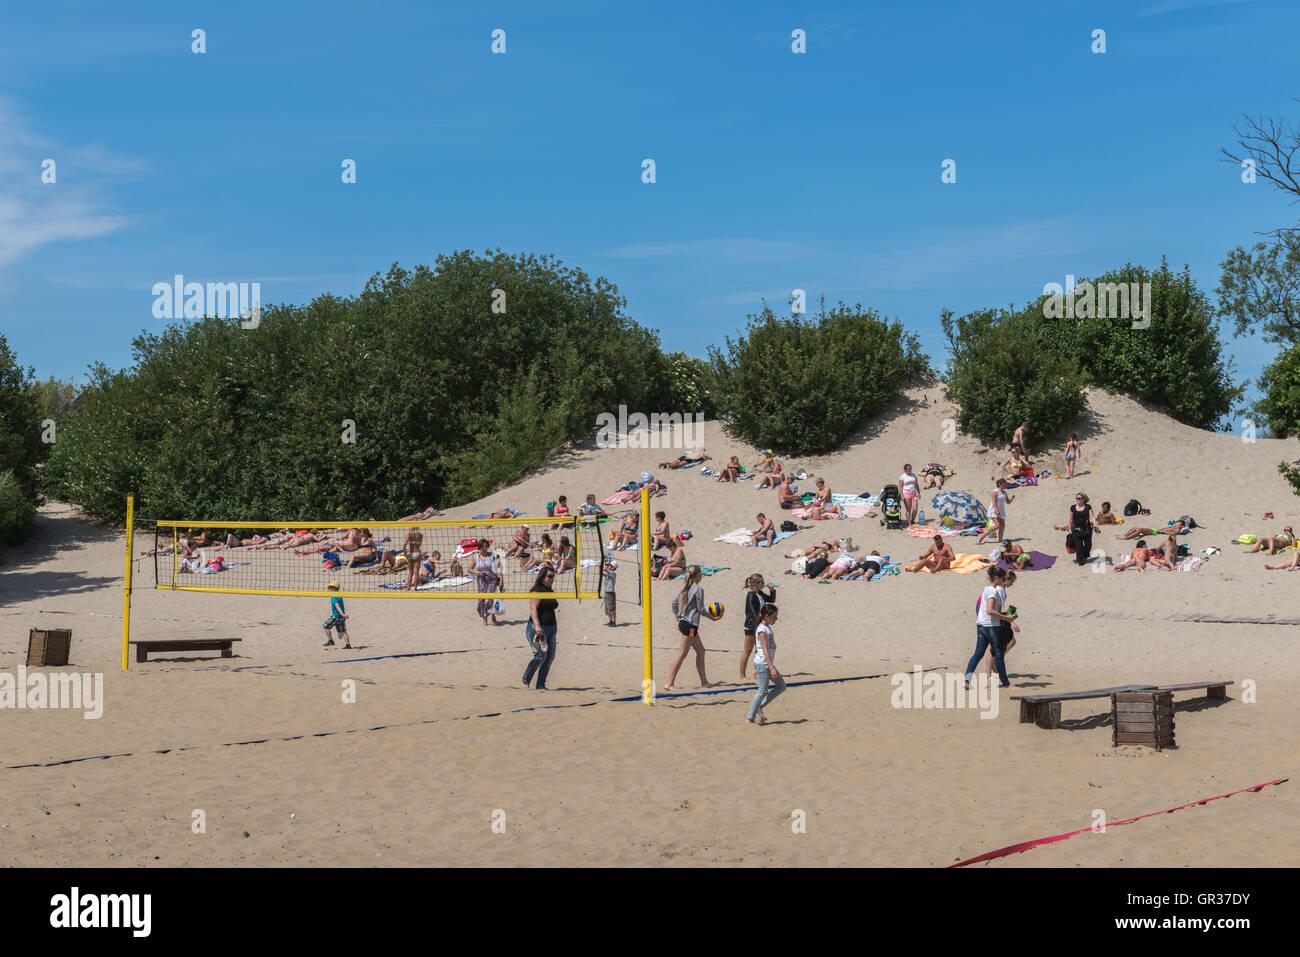 Sunbathing on a dune at the Baltic  seaside-resort  Zelenogradsk, ex Cranz, Kaliningrad Region, Russia, - Stock Image